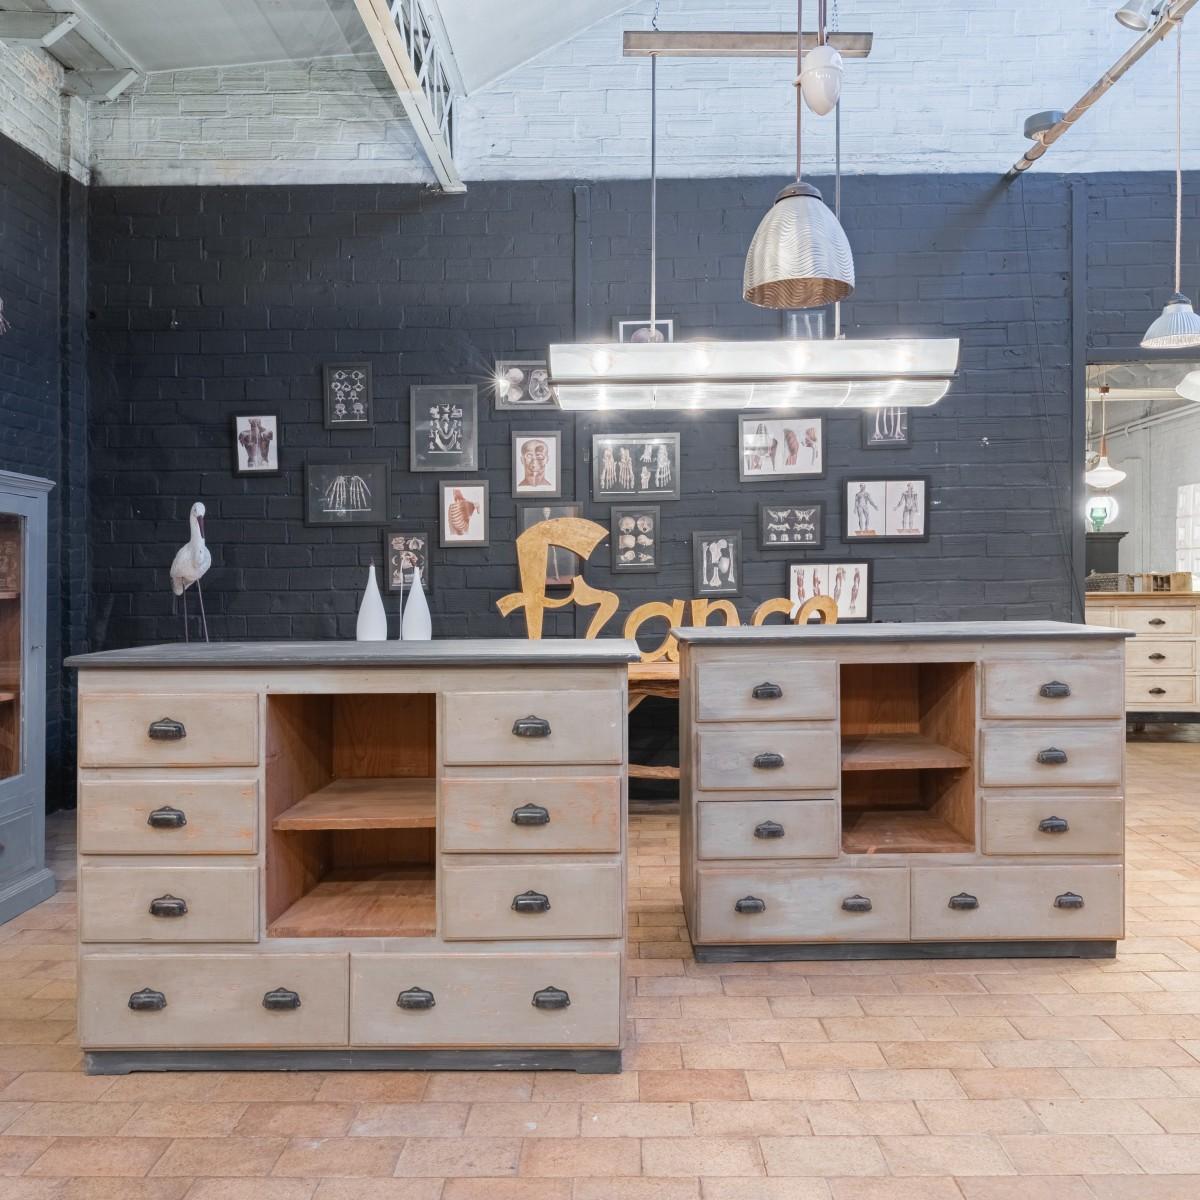 Pair of wooden workshop furniture